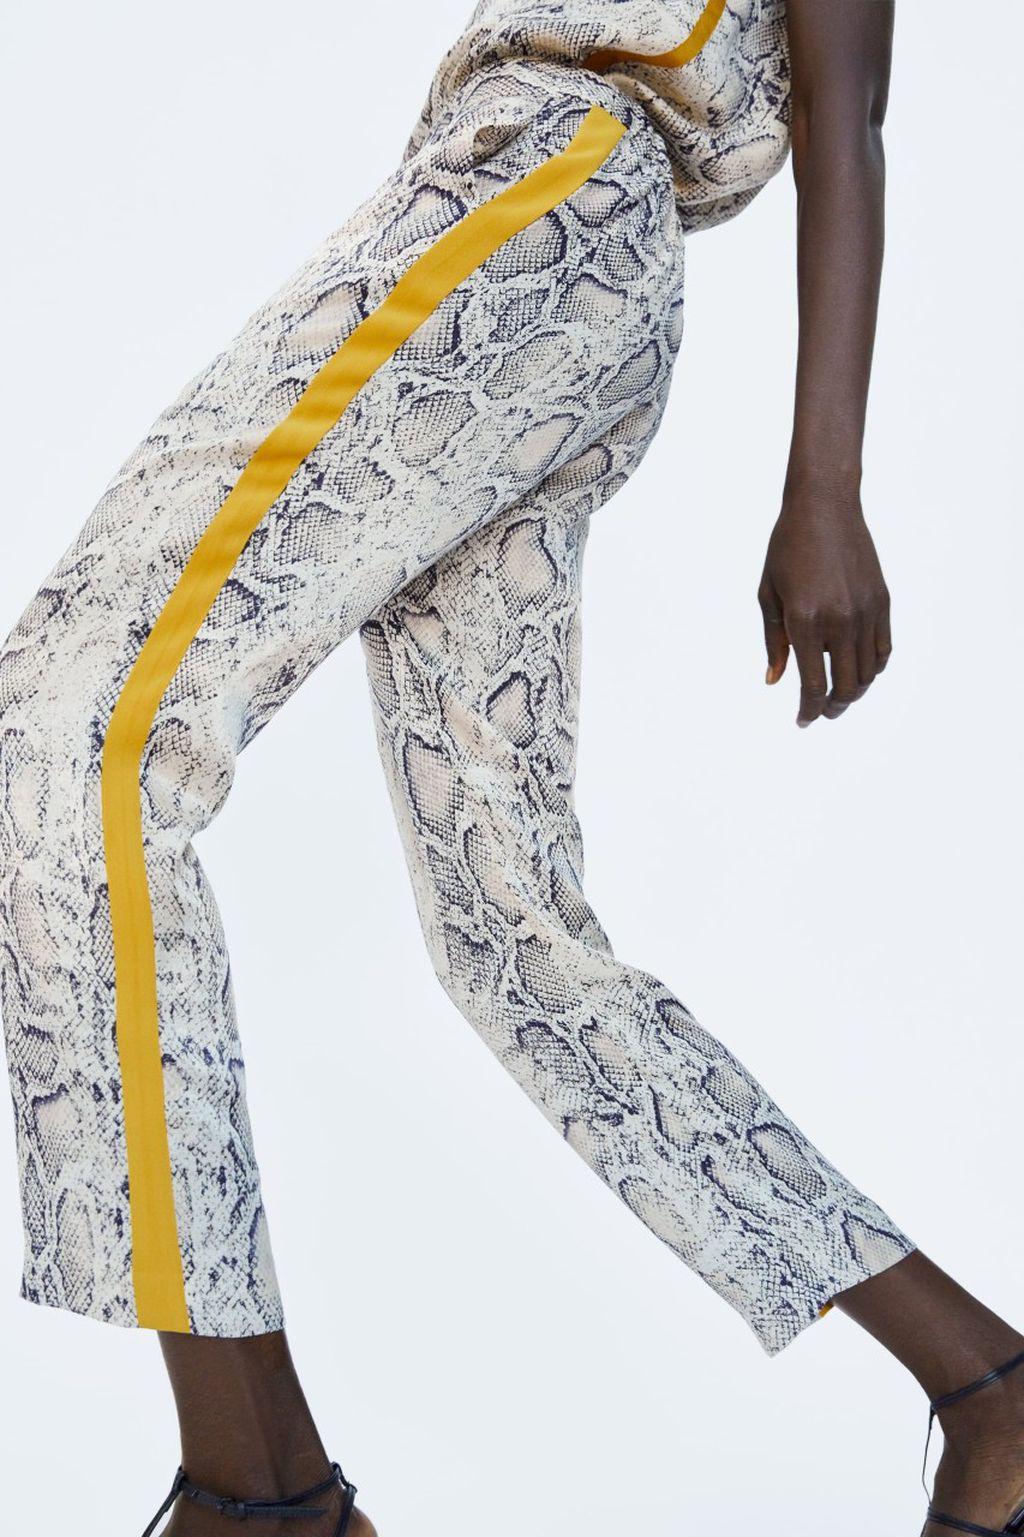 Hlače brenda Zara sa zmijskim uzorkom